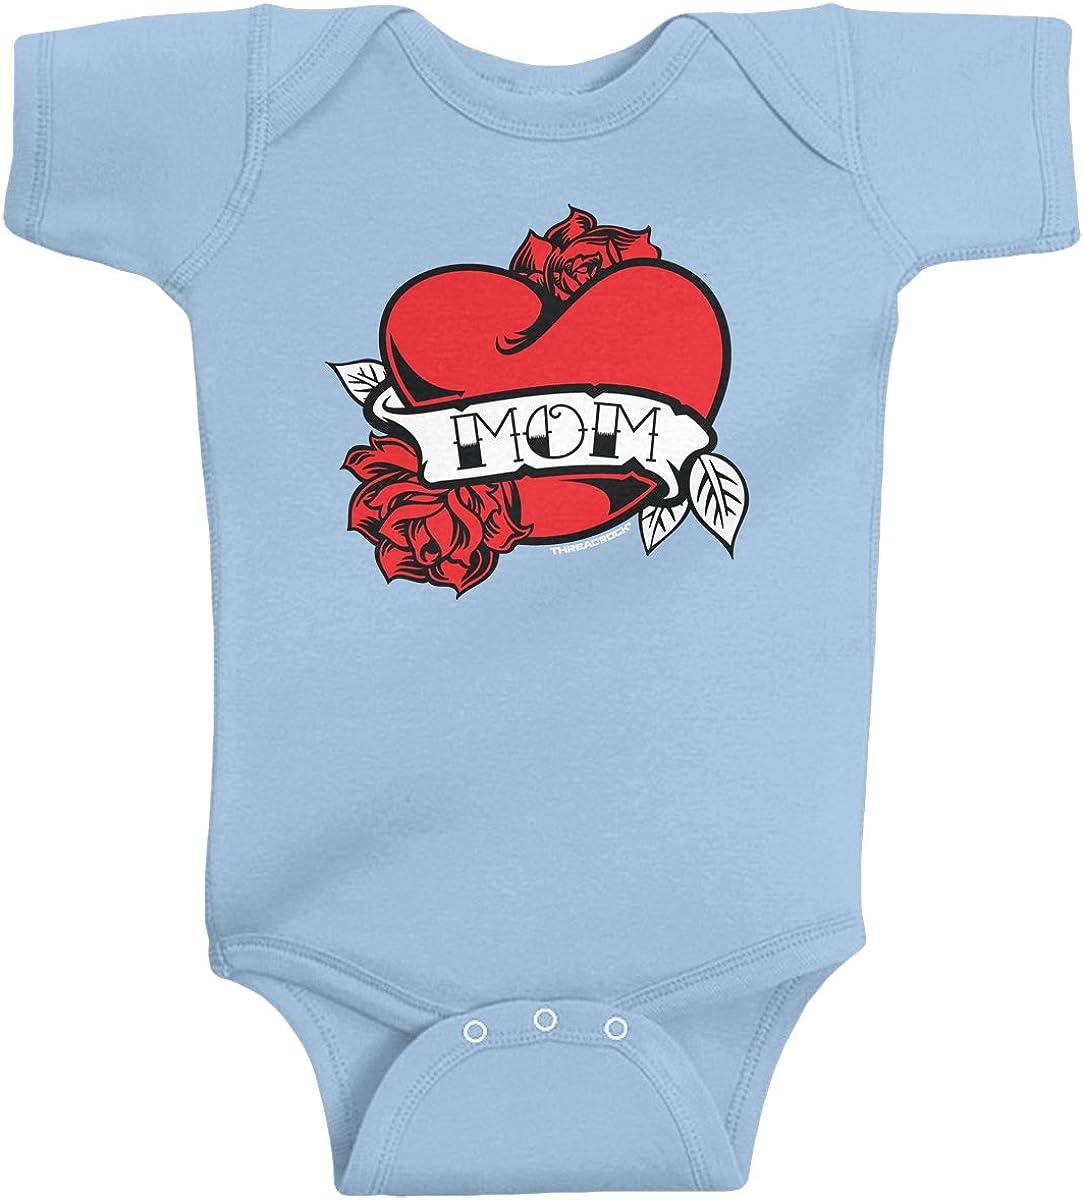 Threadrock Baby Boys' Mom Heart Tattoo Infant Bodysuit